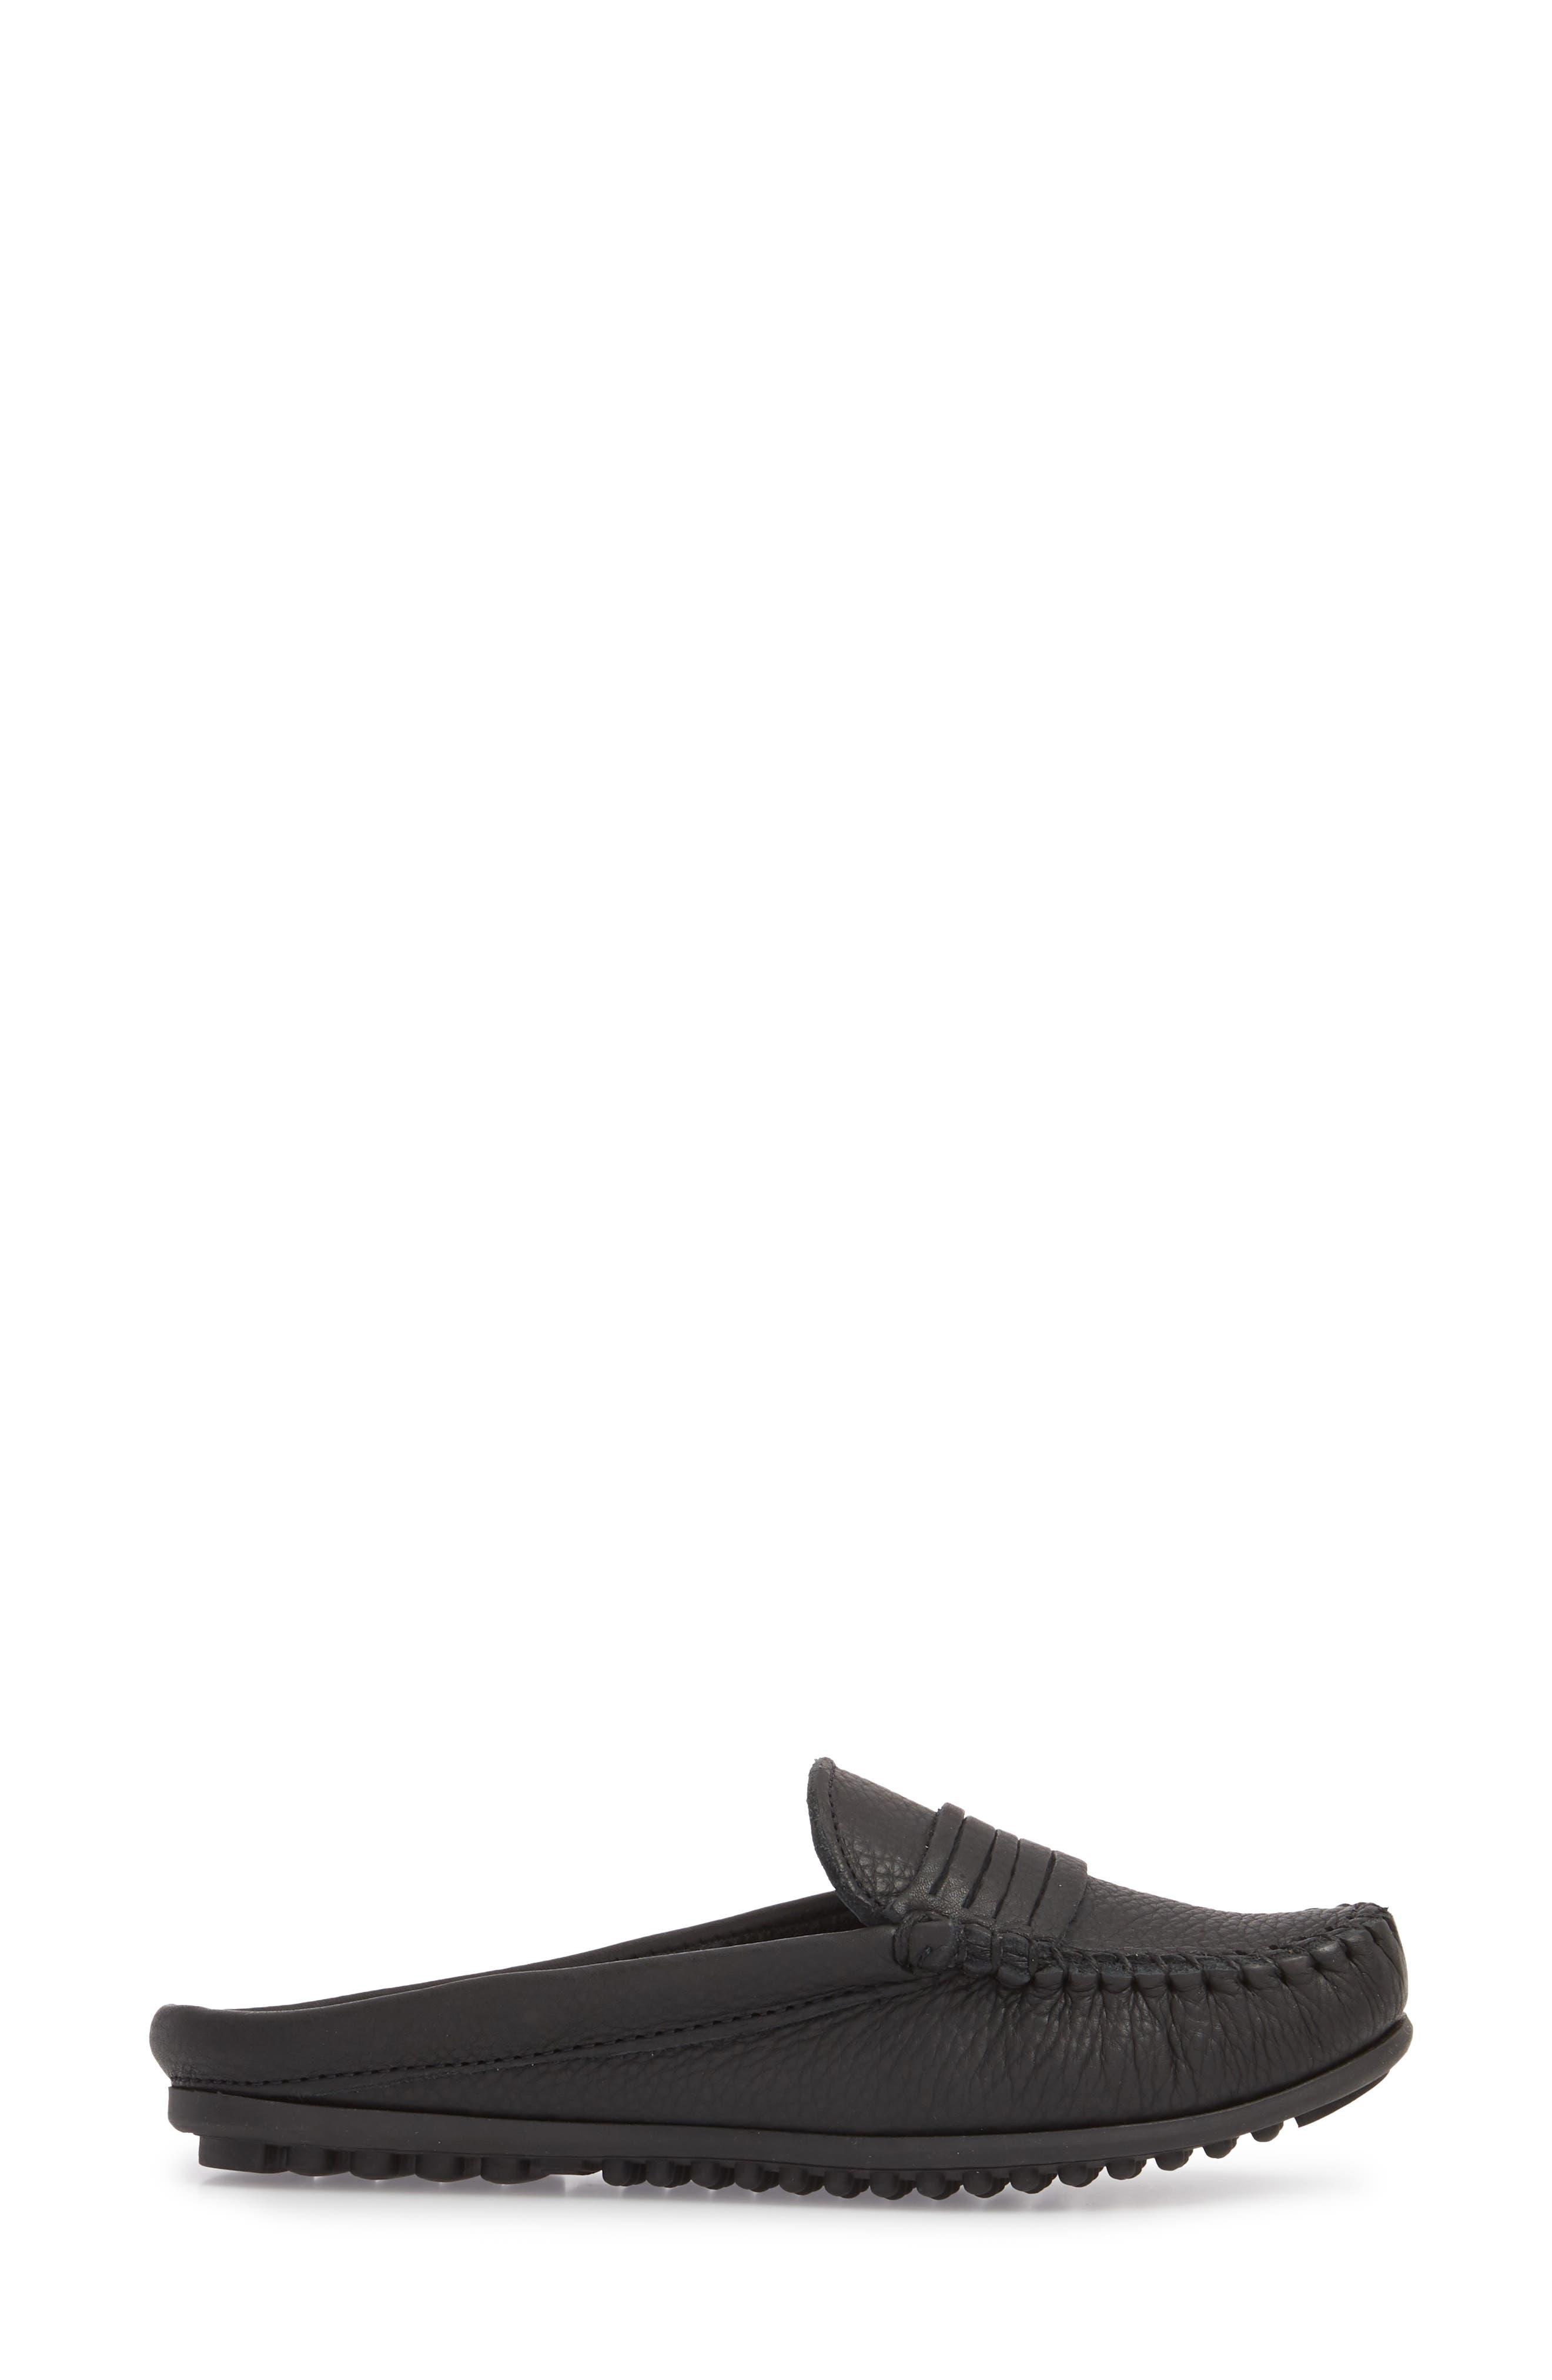 MINNETONKA, Kate Moc Toe Loafer Mule, Alternate thumbnail 3, color, BLACK